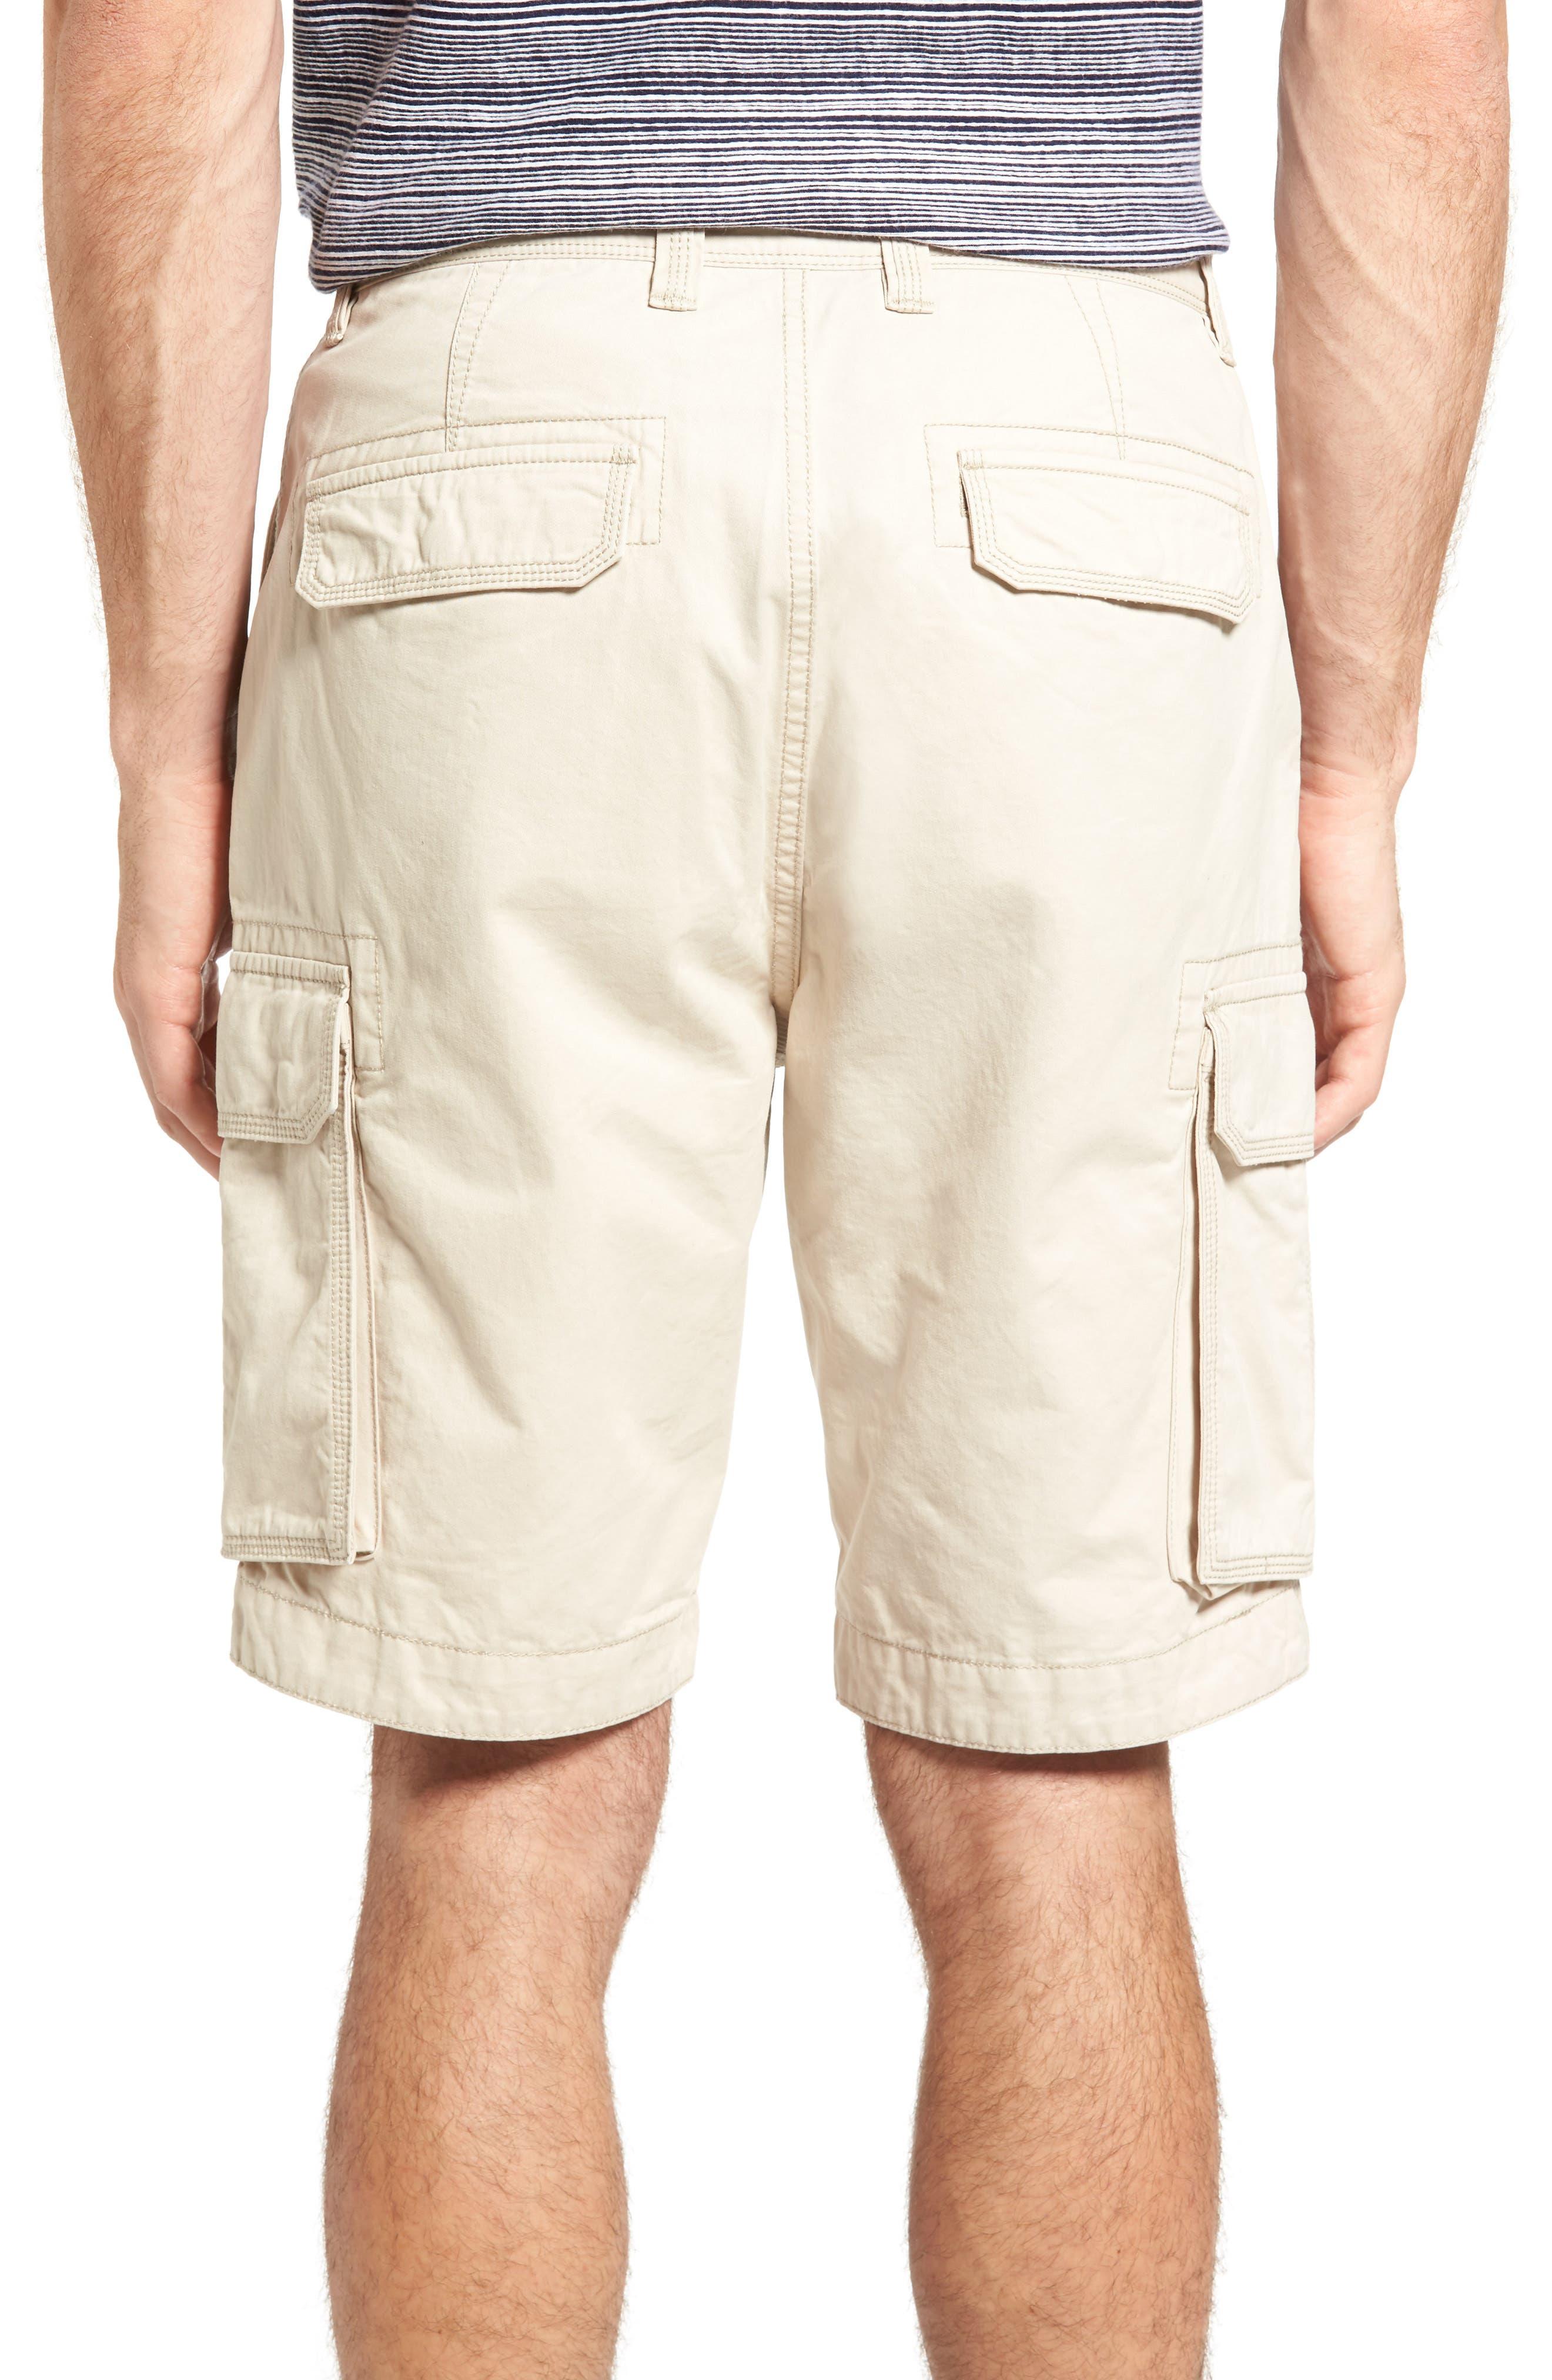 Homewood Utility Shorts,                             Alternate thumbnail 2, color,                             252